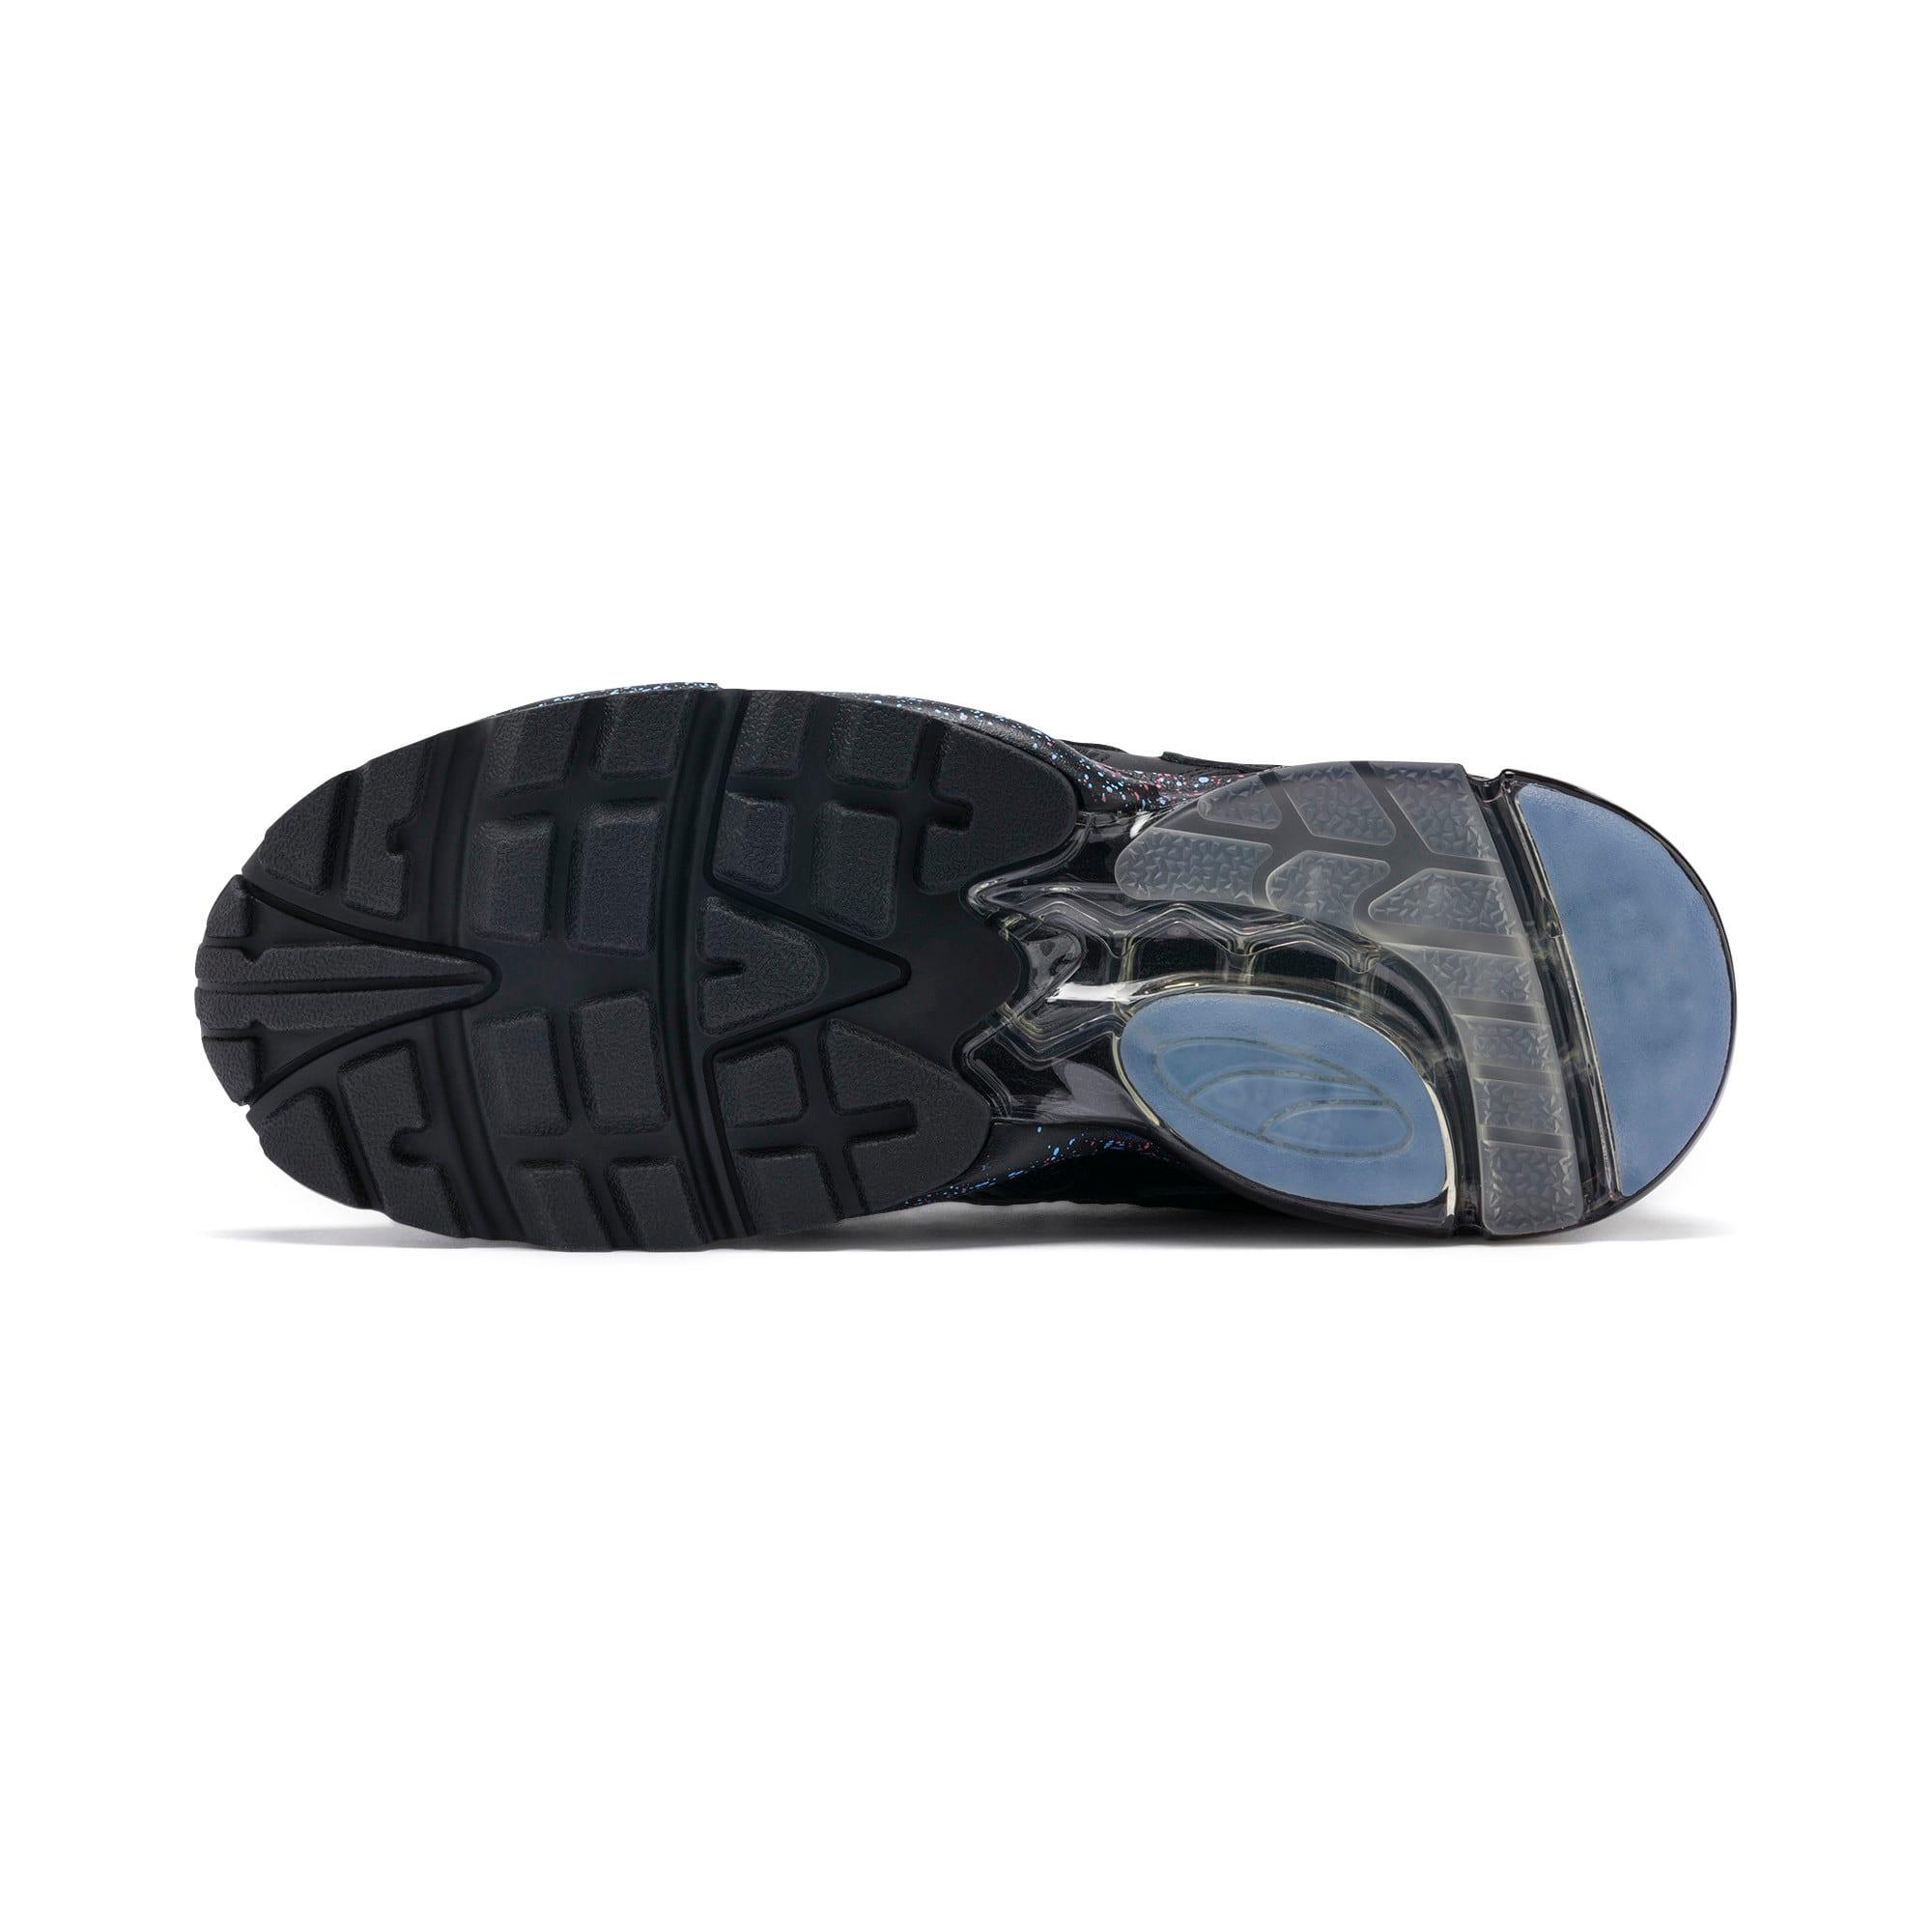 Thumbnail 4 of CELL Alien Space Explorer Sneaker, Puma Black-Puma Black, medium